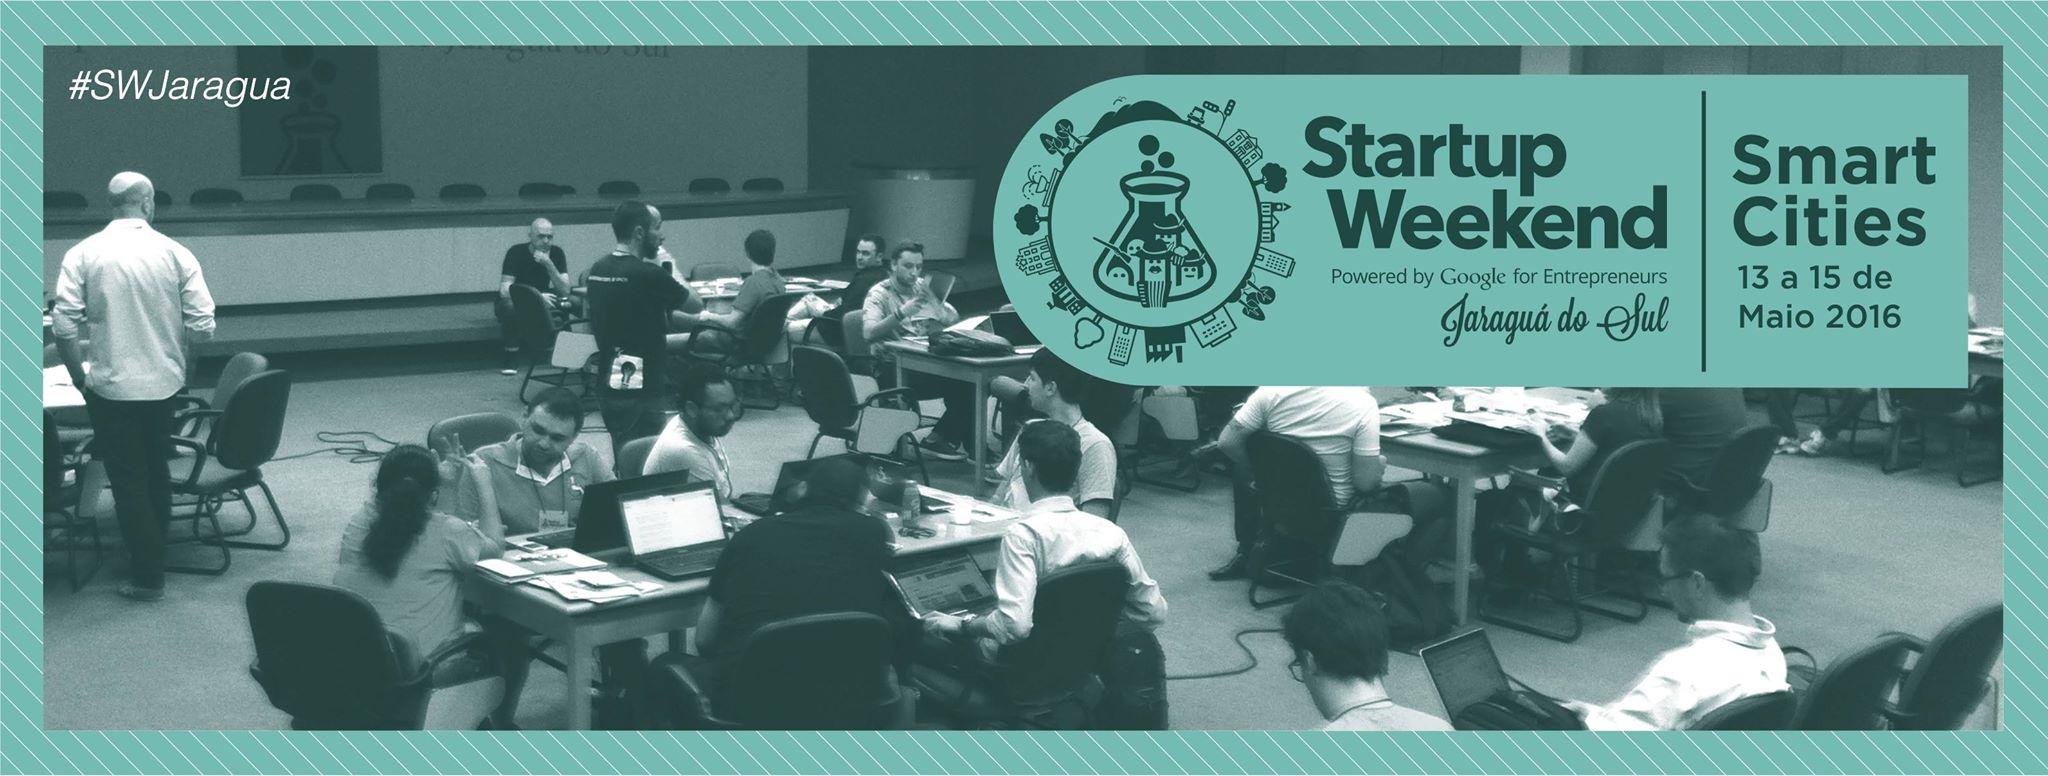 VIA Faz PIT STOP Para Startup Weekend Brasileiro Sobre Smart Cities